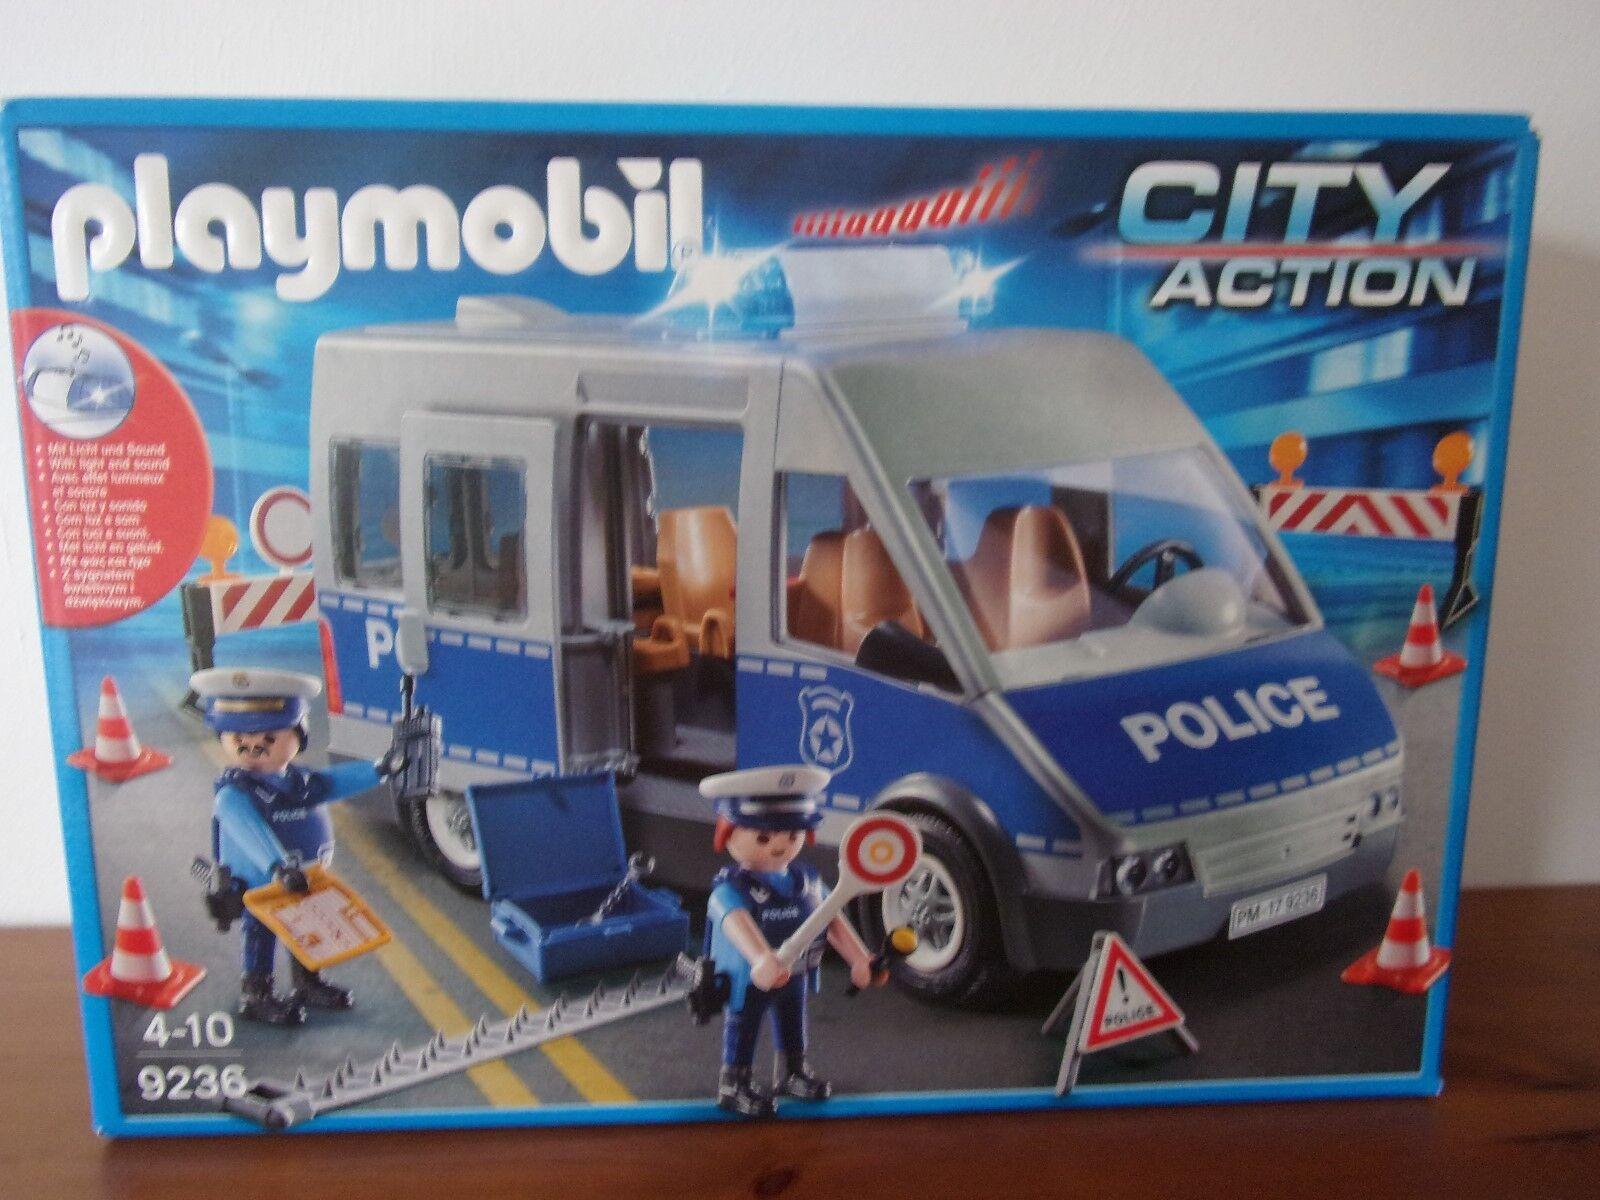 PLAYMOBIL City Action 9236 Police Autobus con straßensperre-Nuovo con imballo